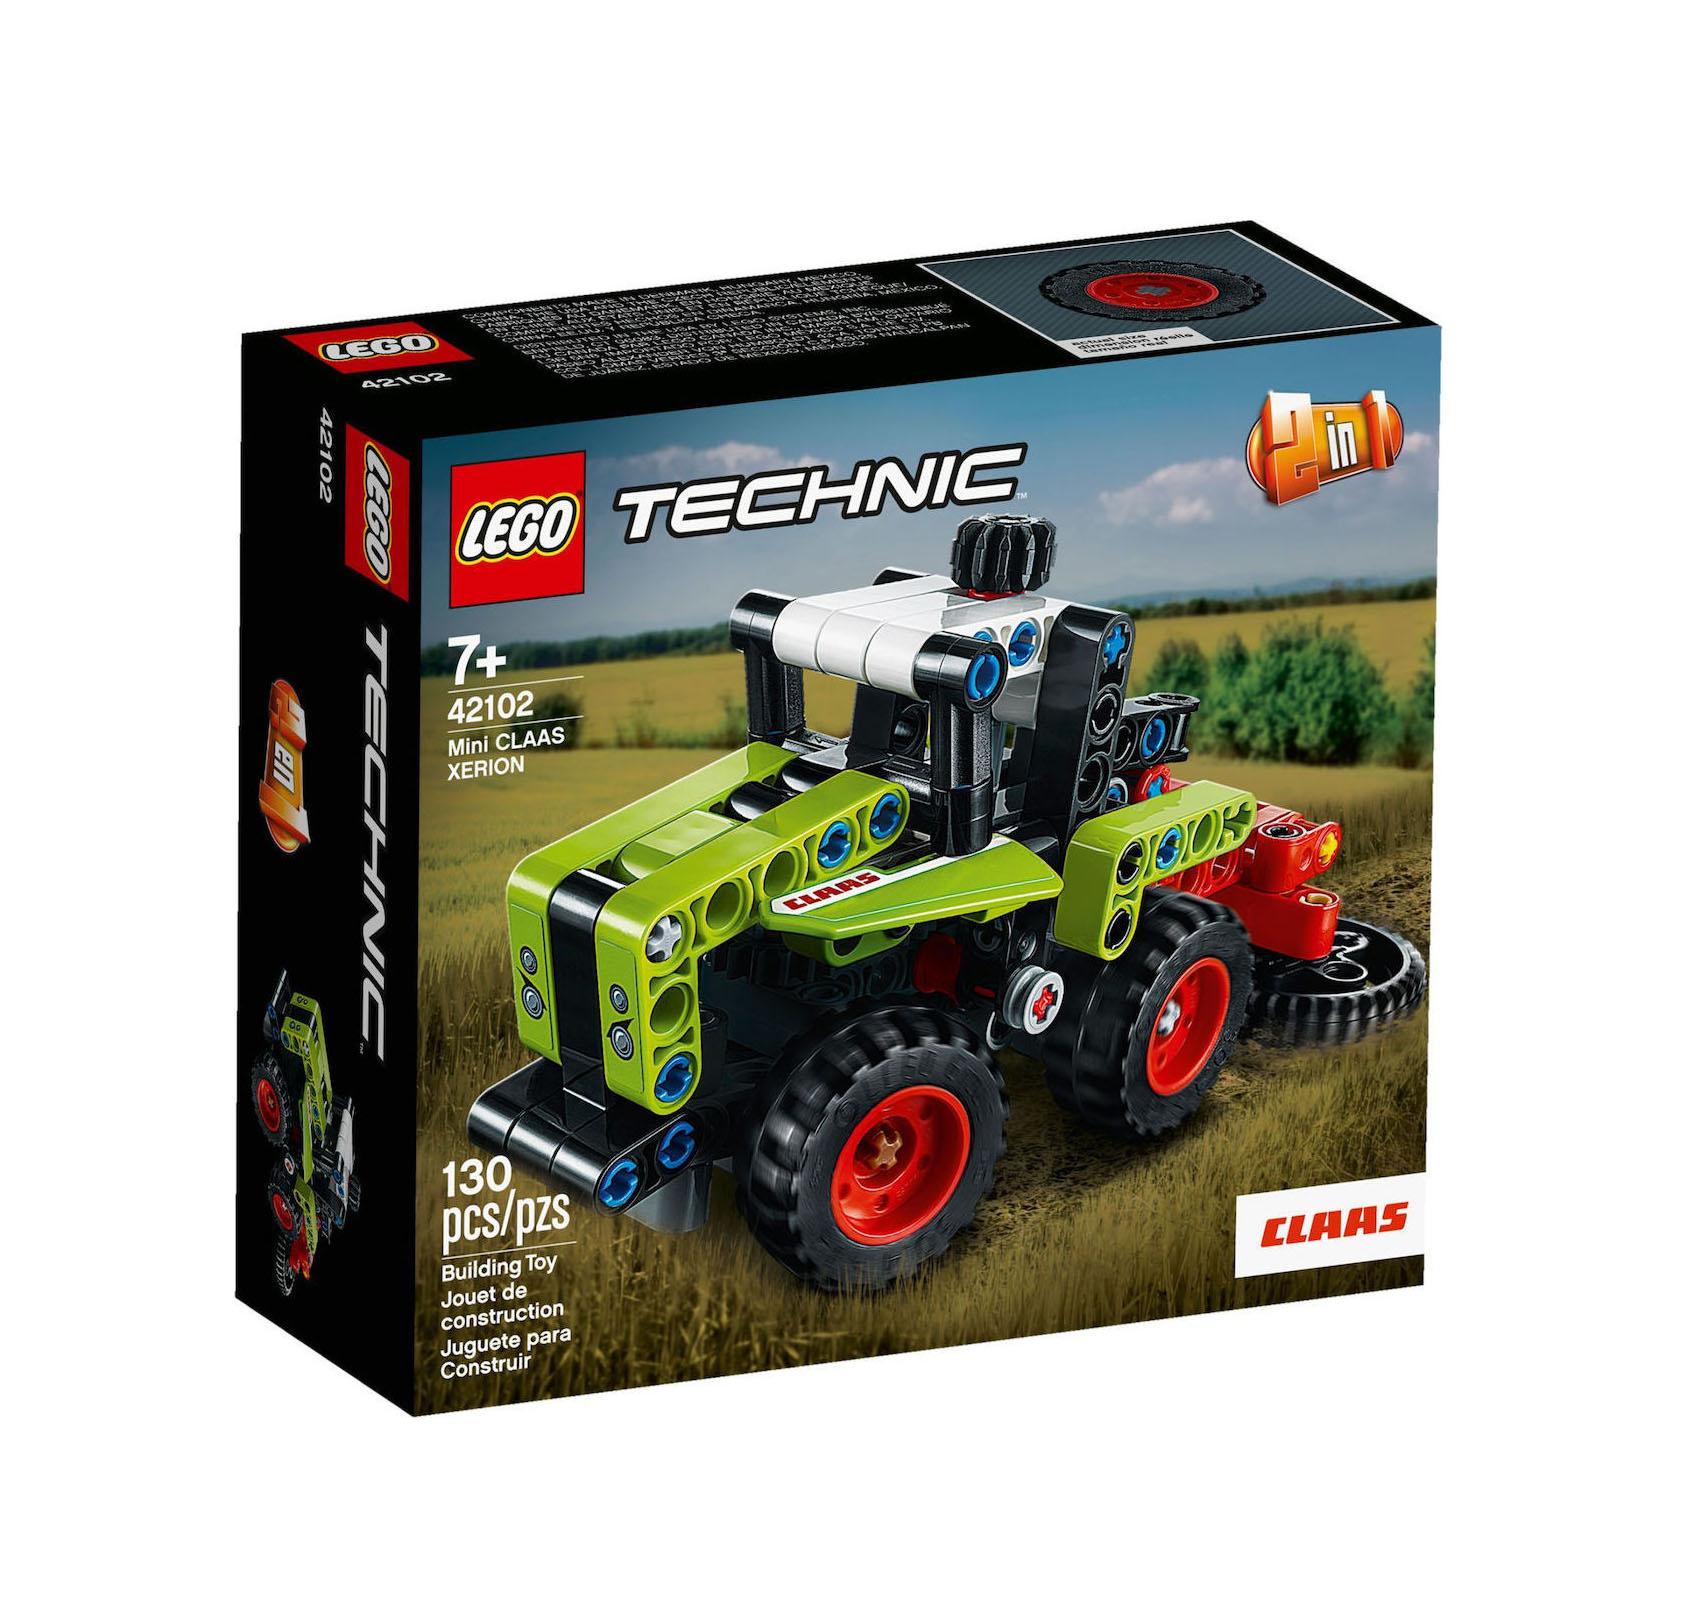 Lego Technic: Mini CLAAS XERION 42102